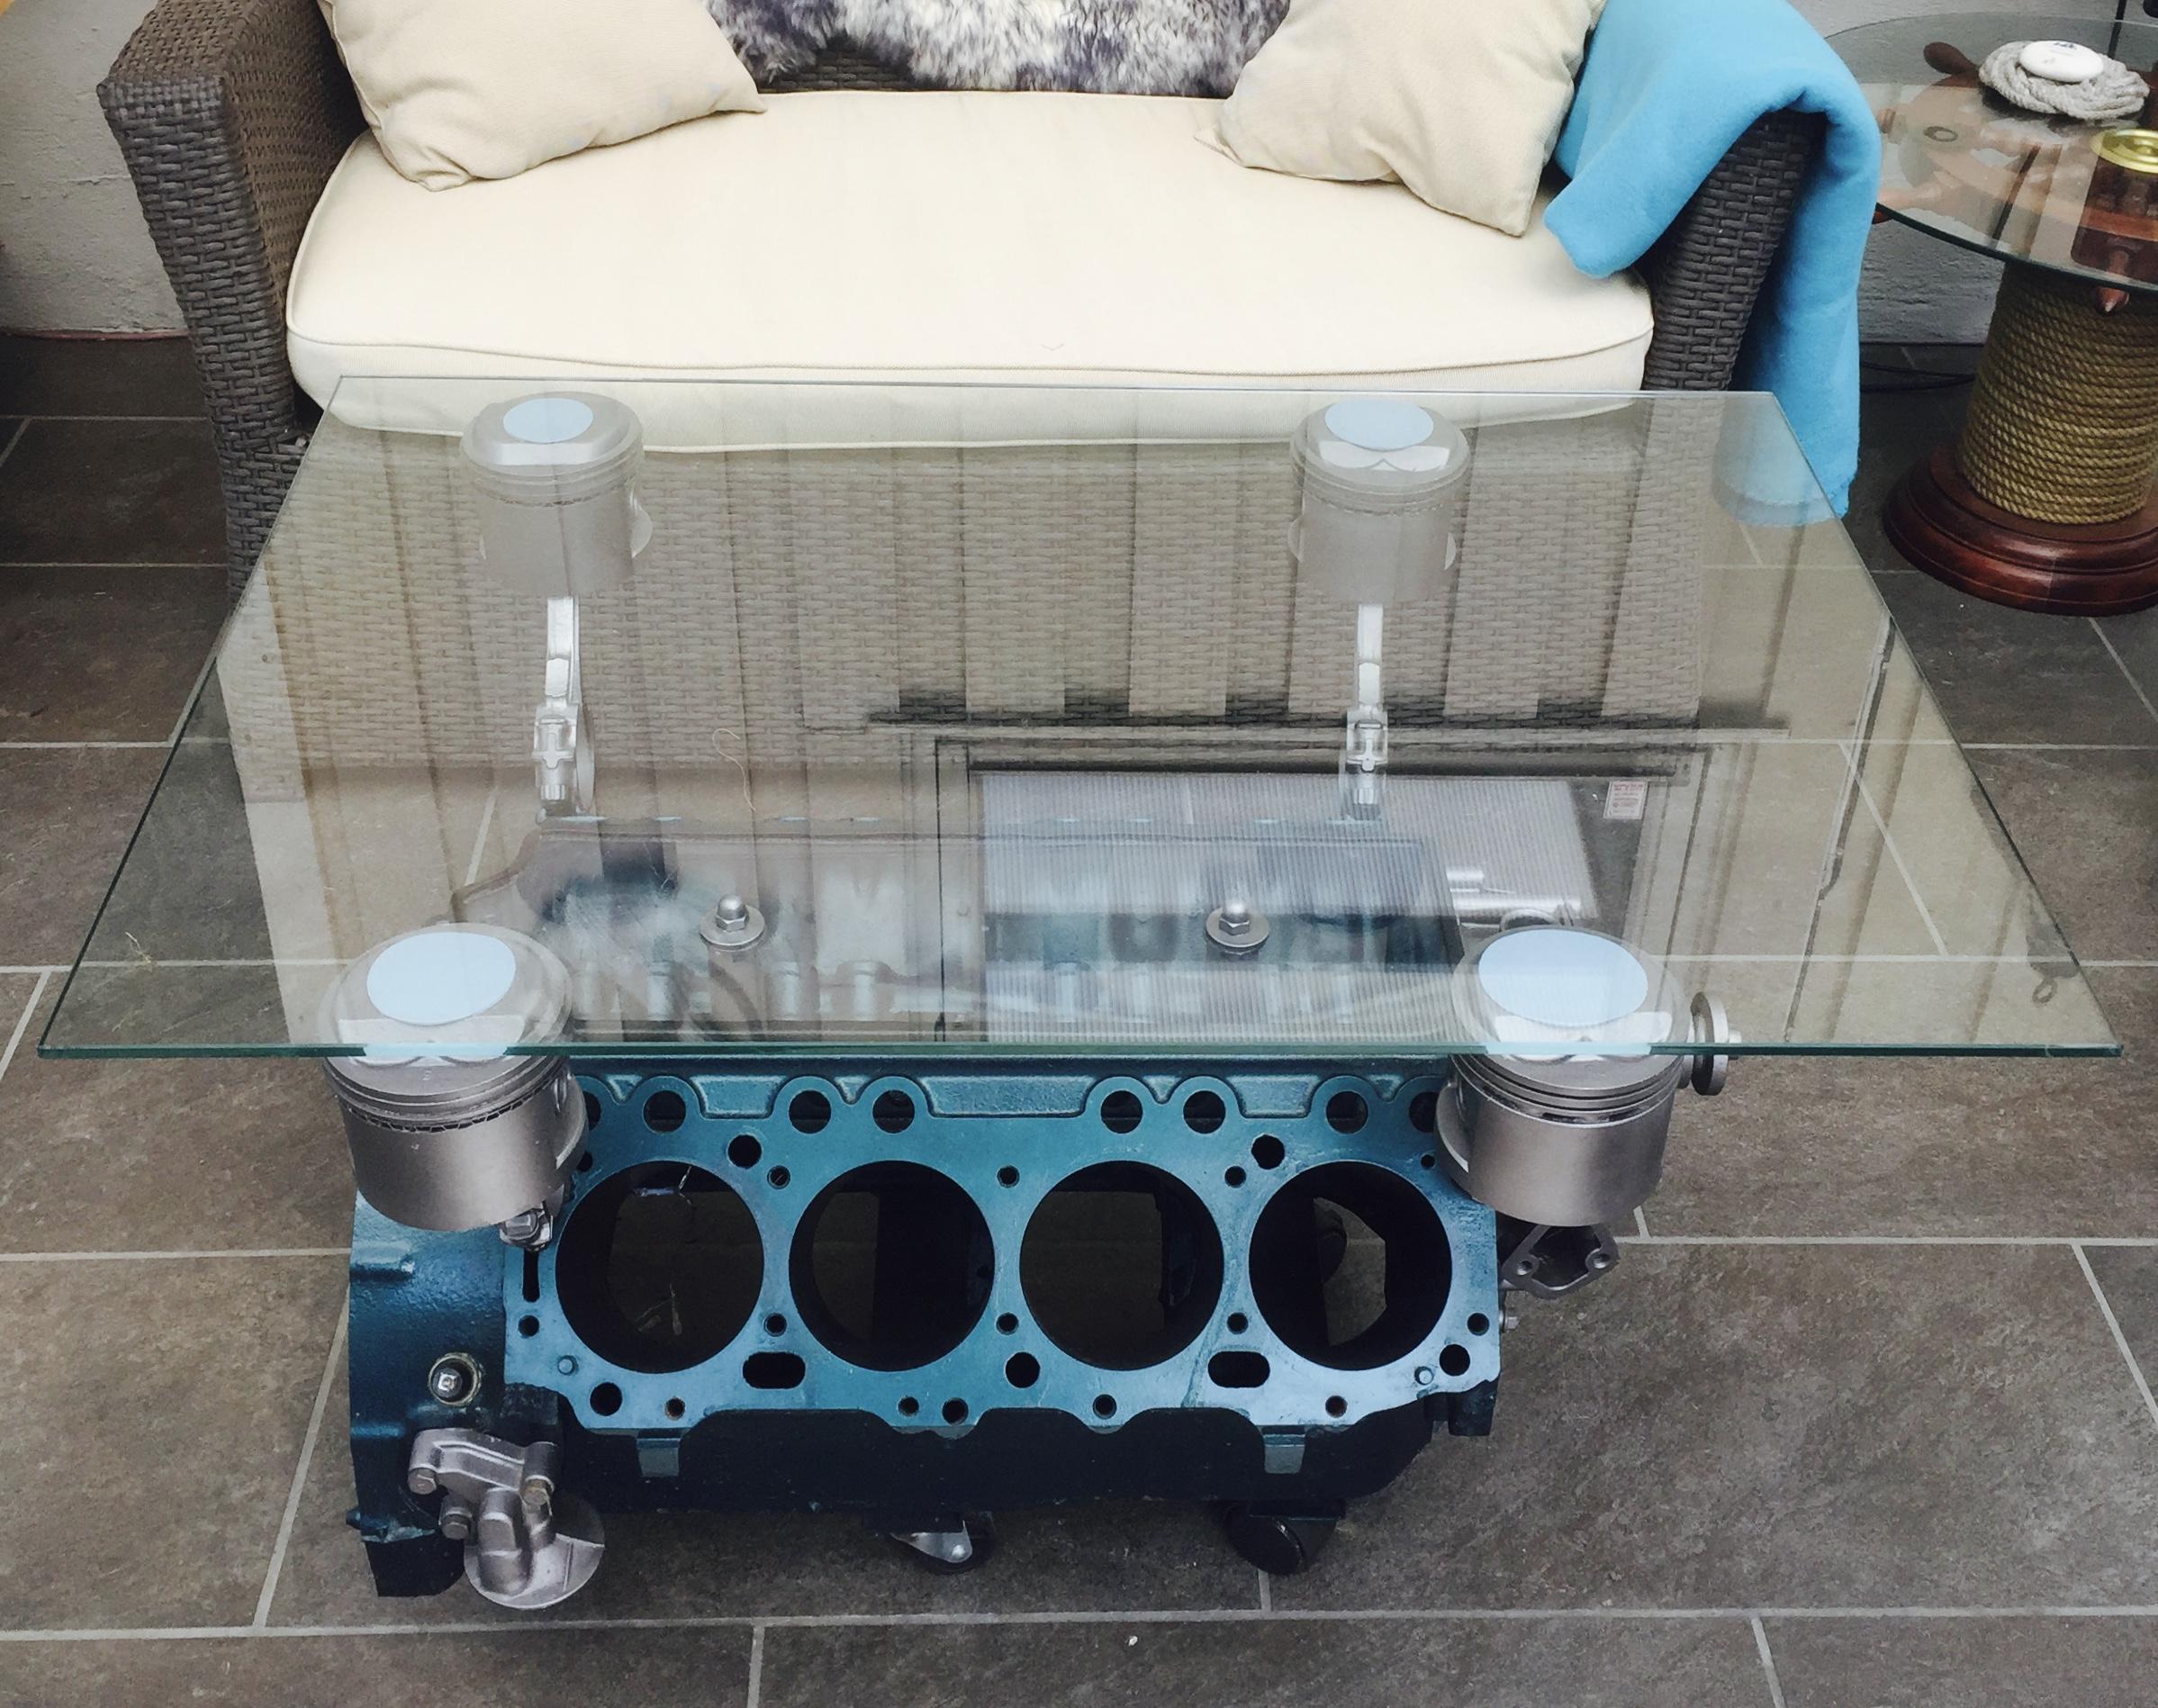 V8 Table in the wintergarden